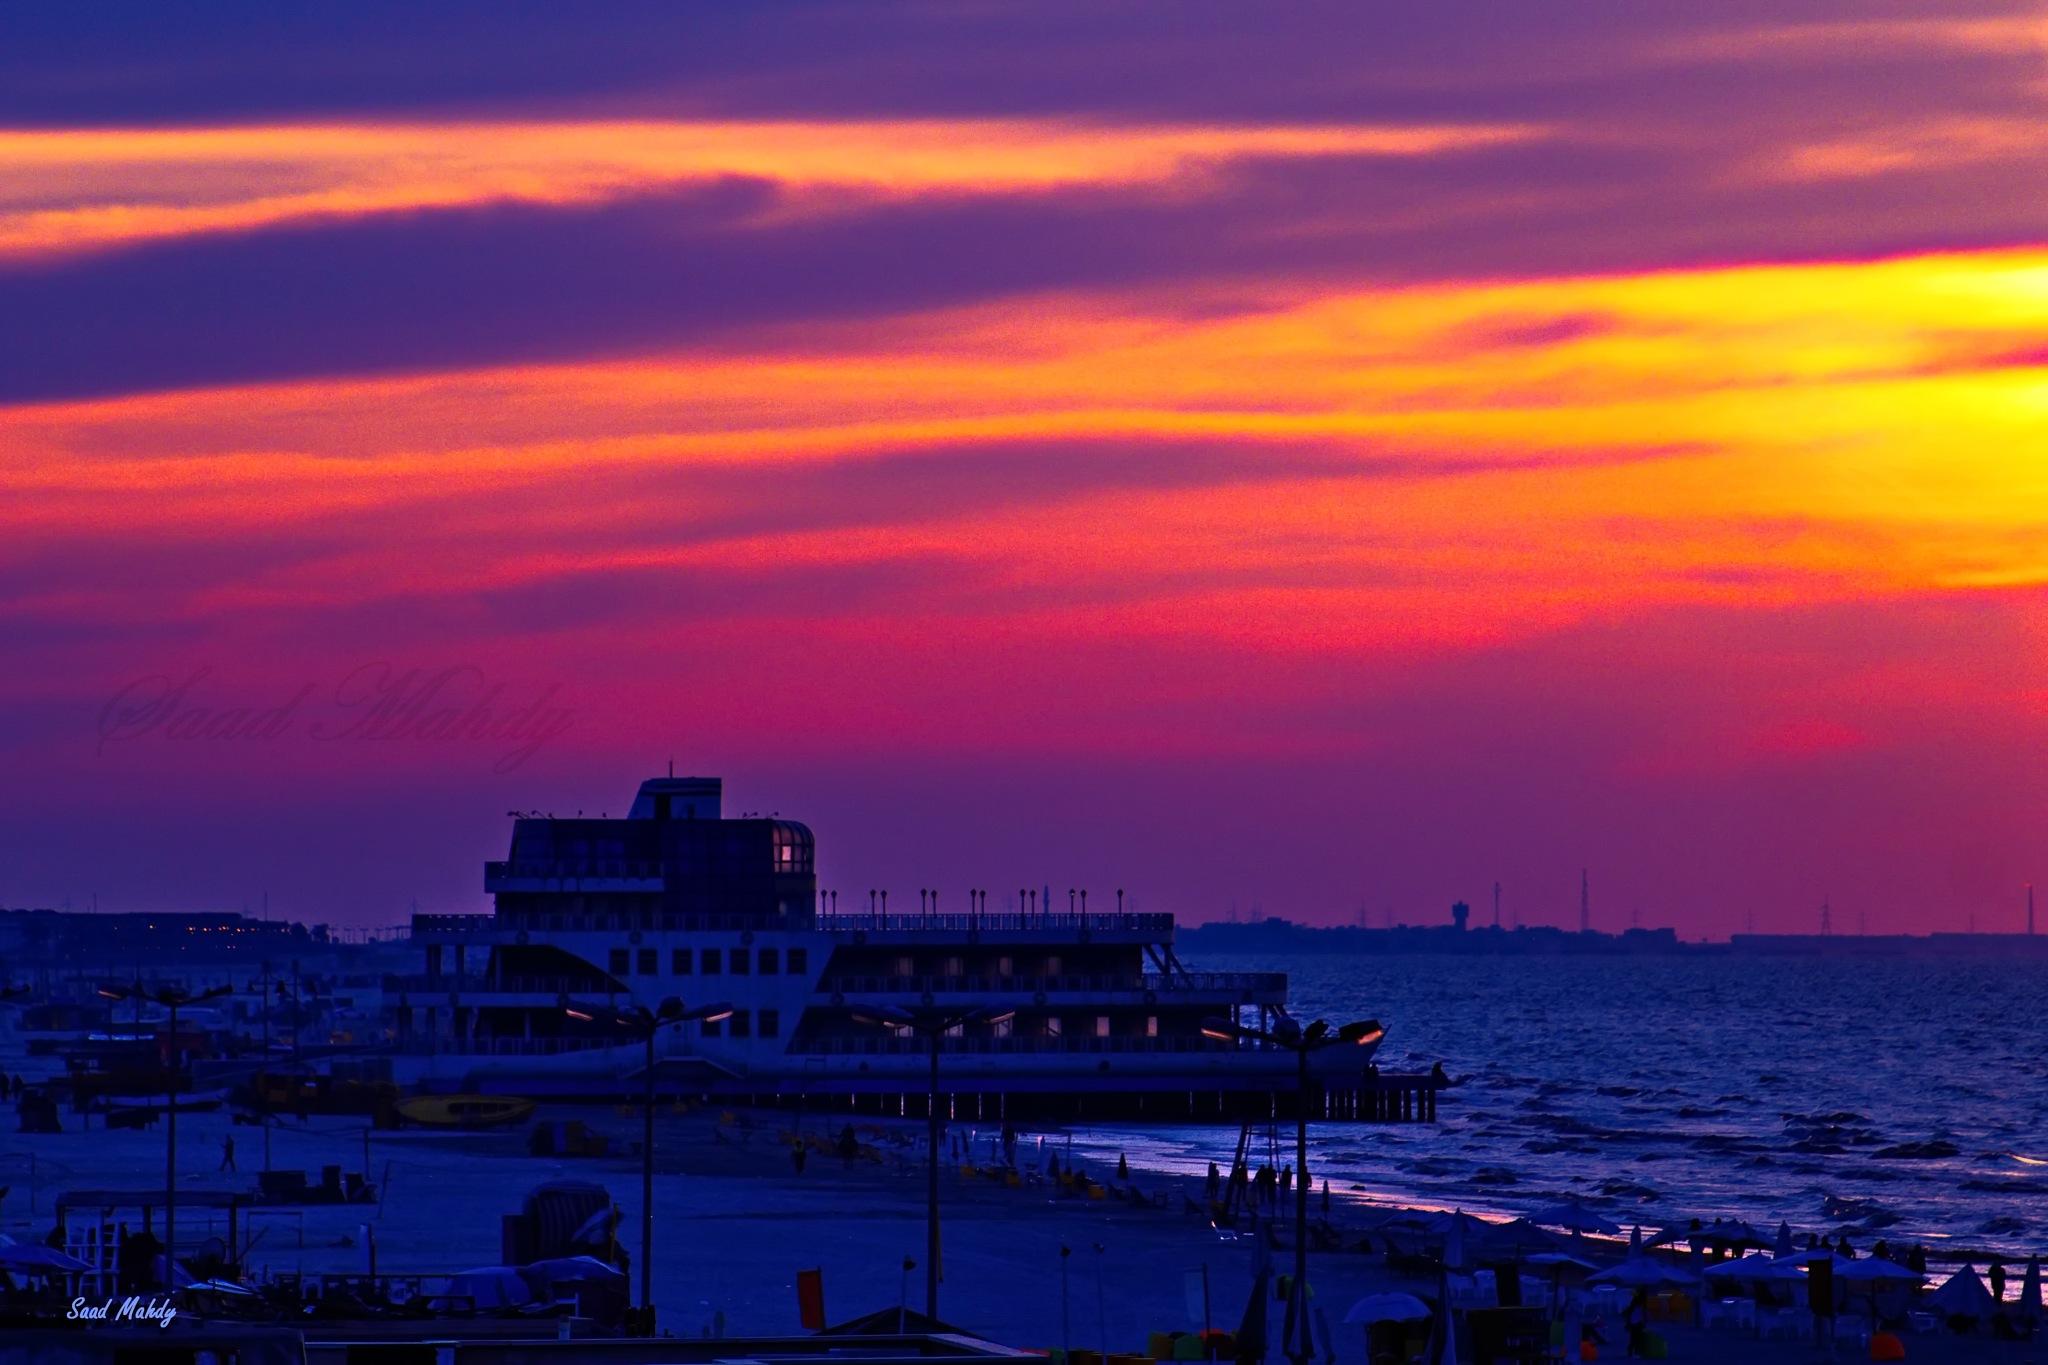 Sunset by Saad Mahdy